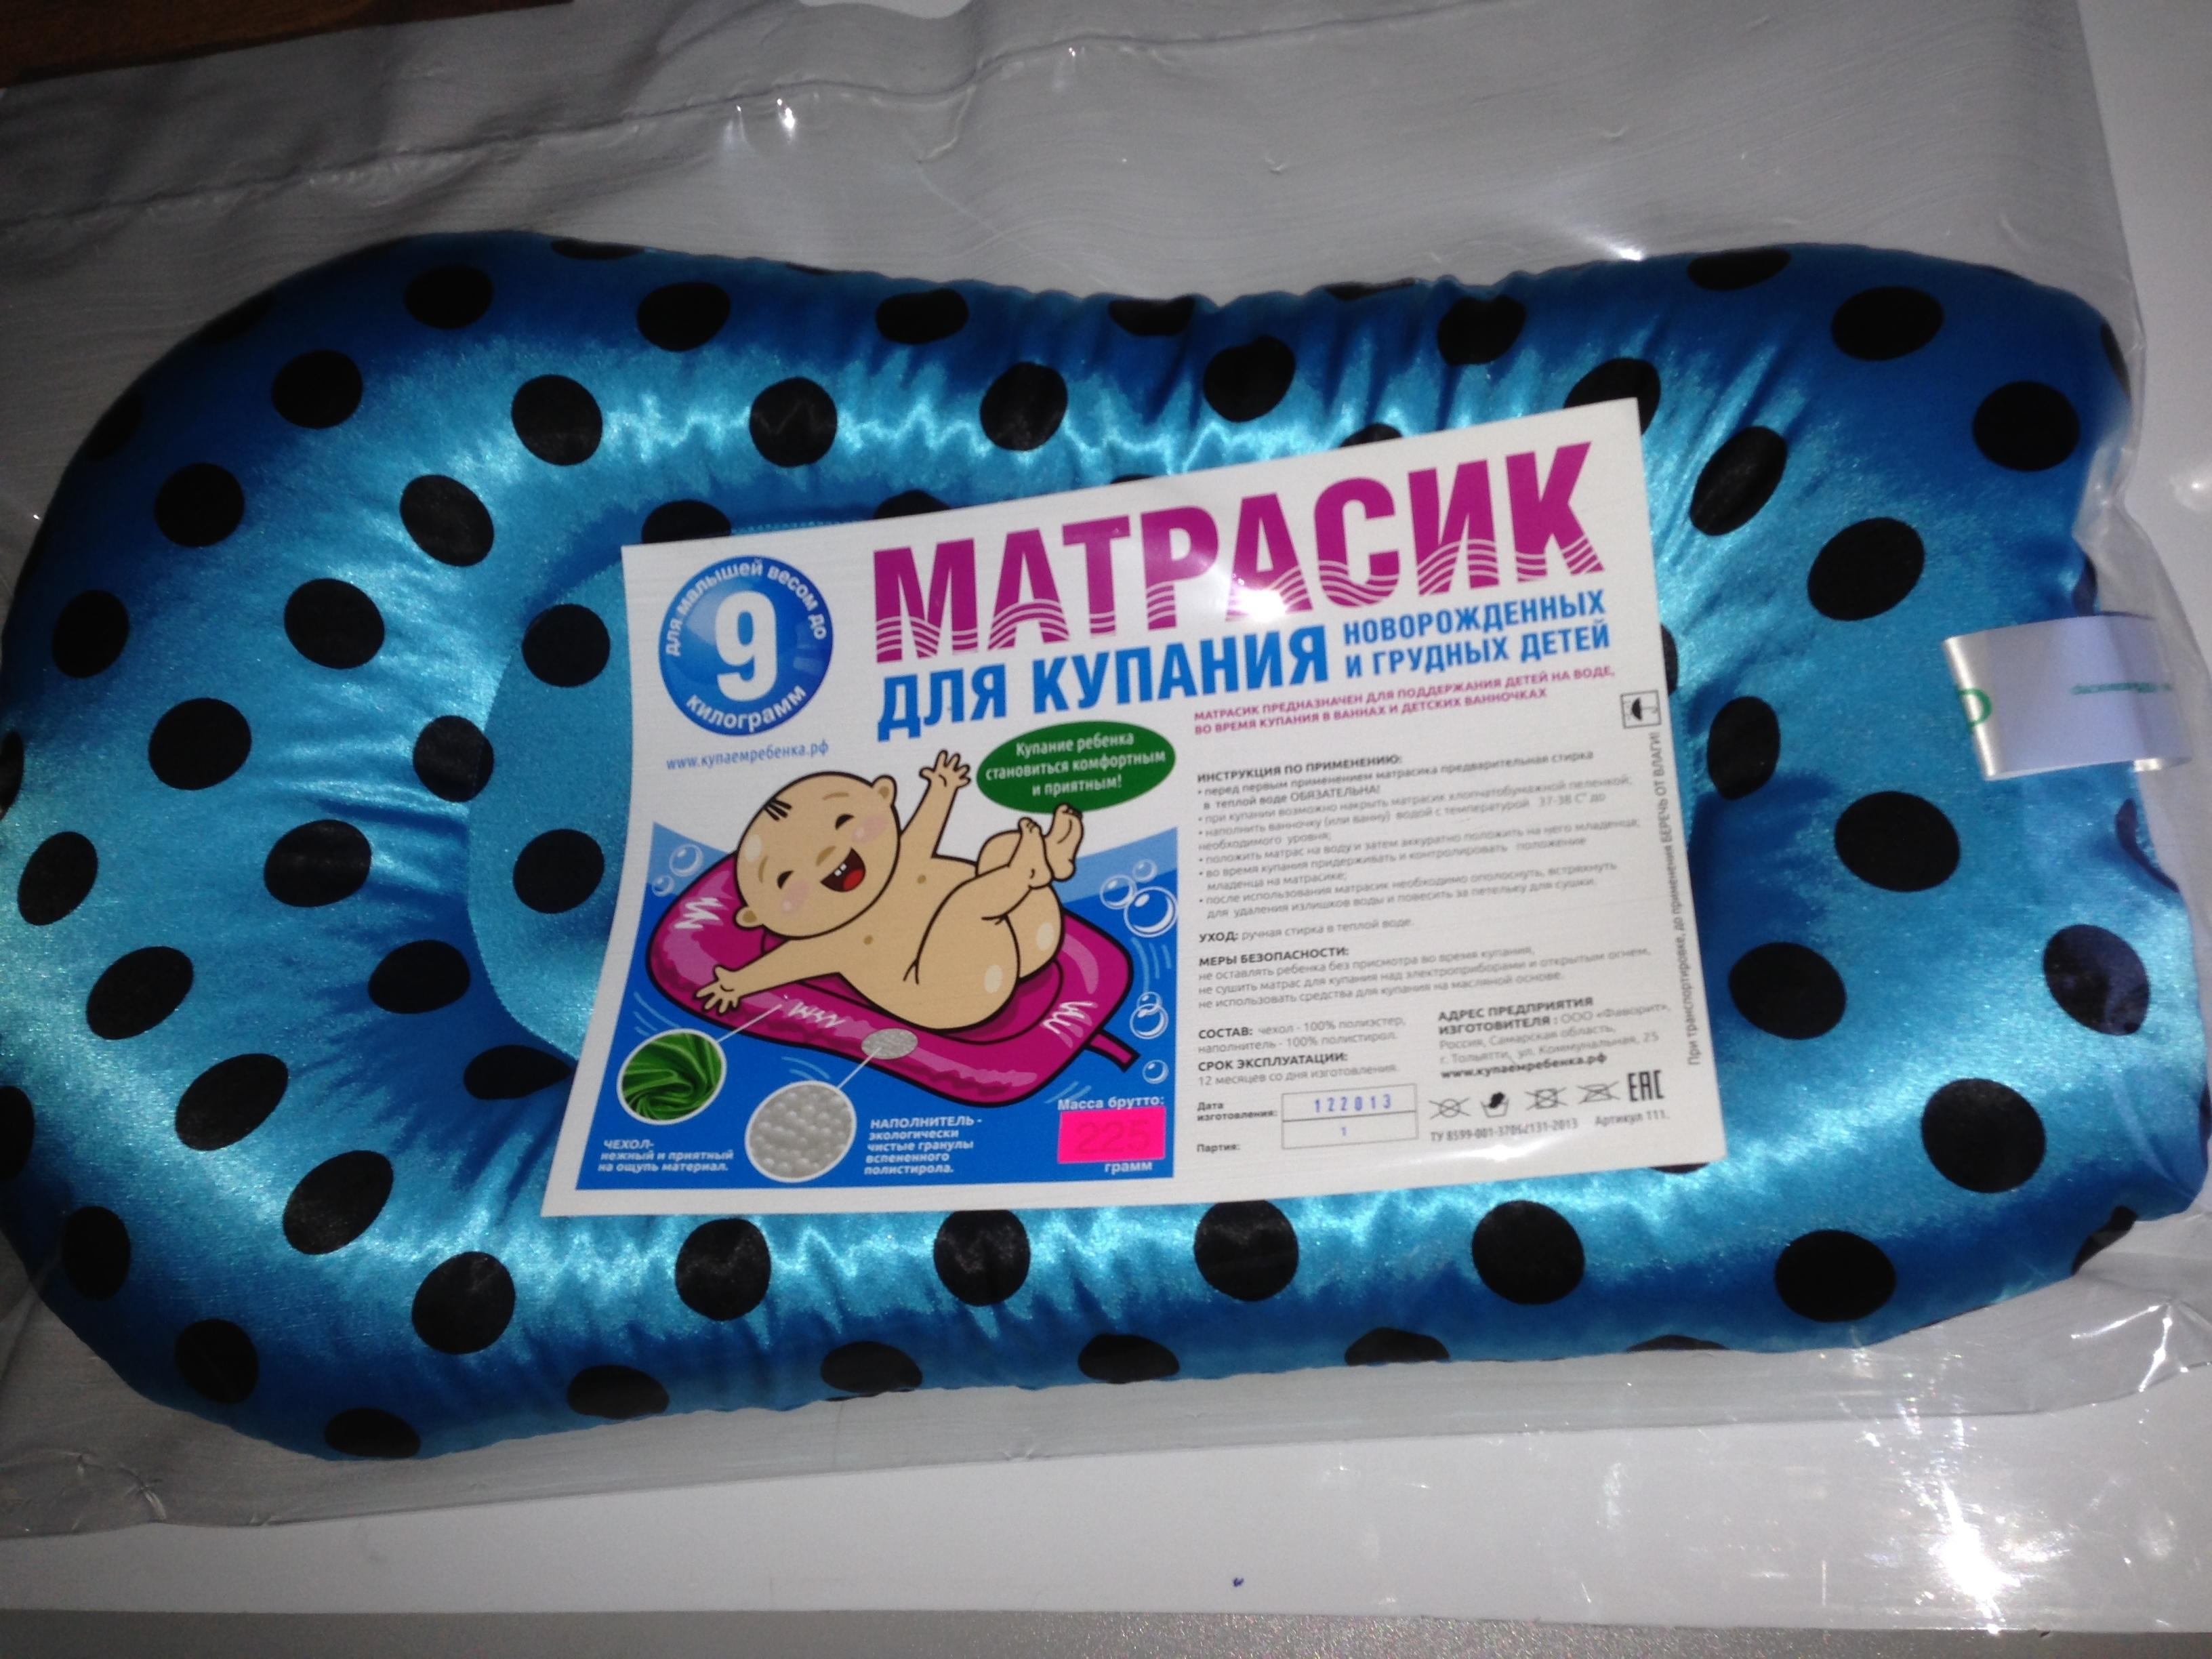 Синий матрасик для купания младенца